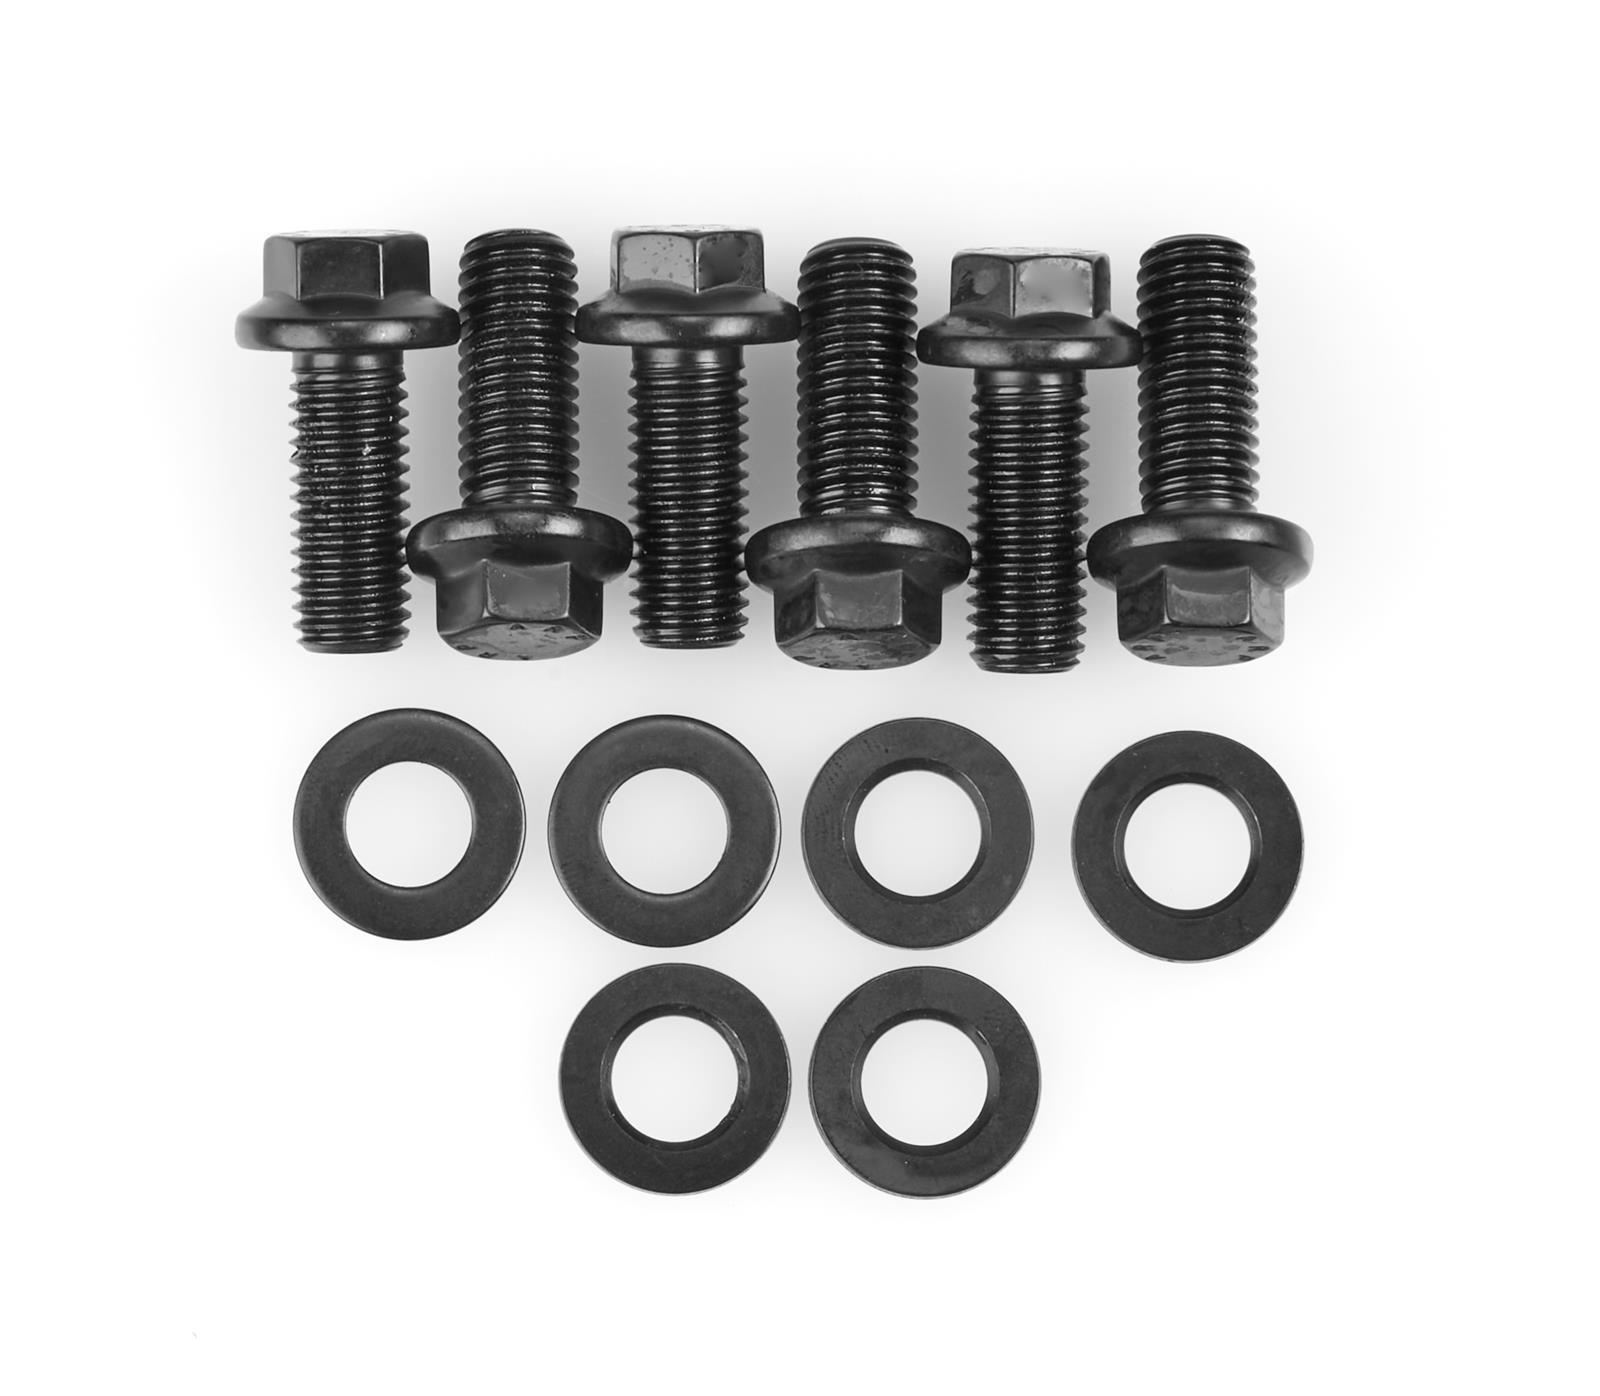 ARP 1342201 Hex Pressure Plate Bolt Kit